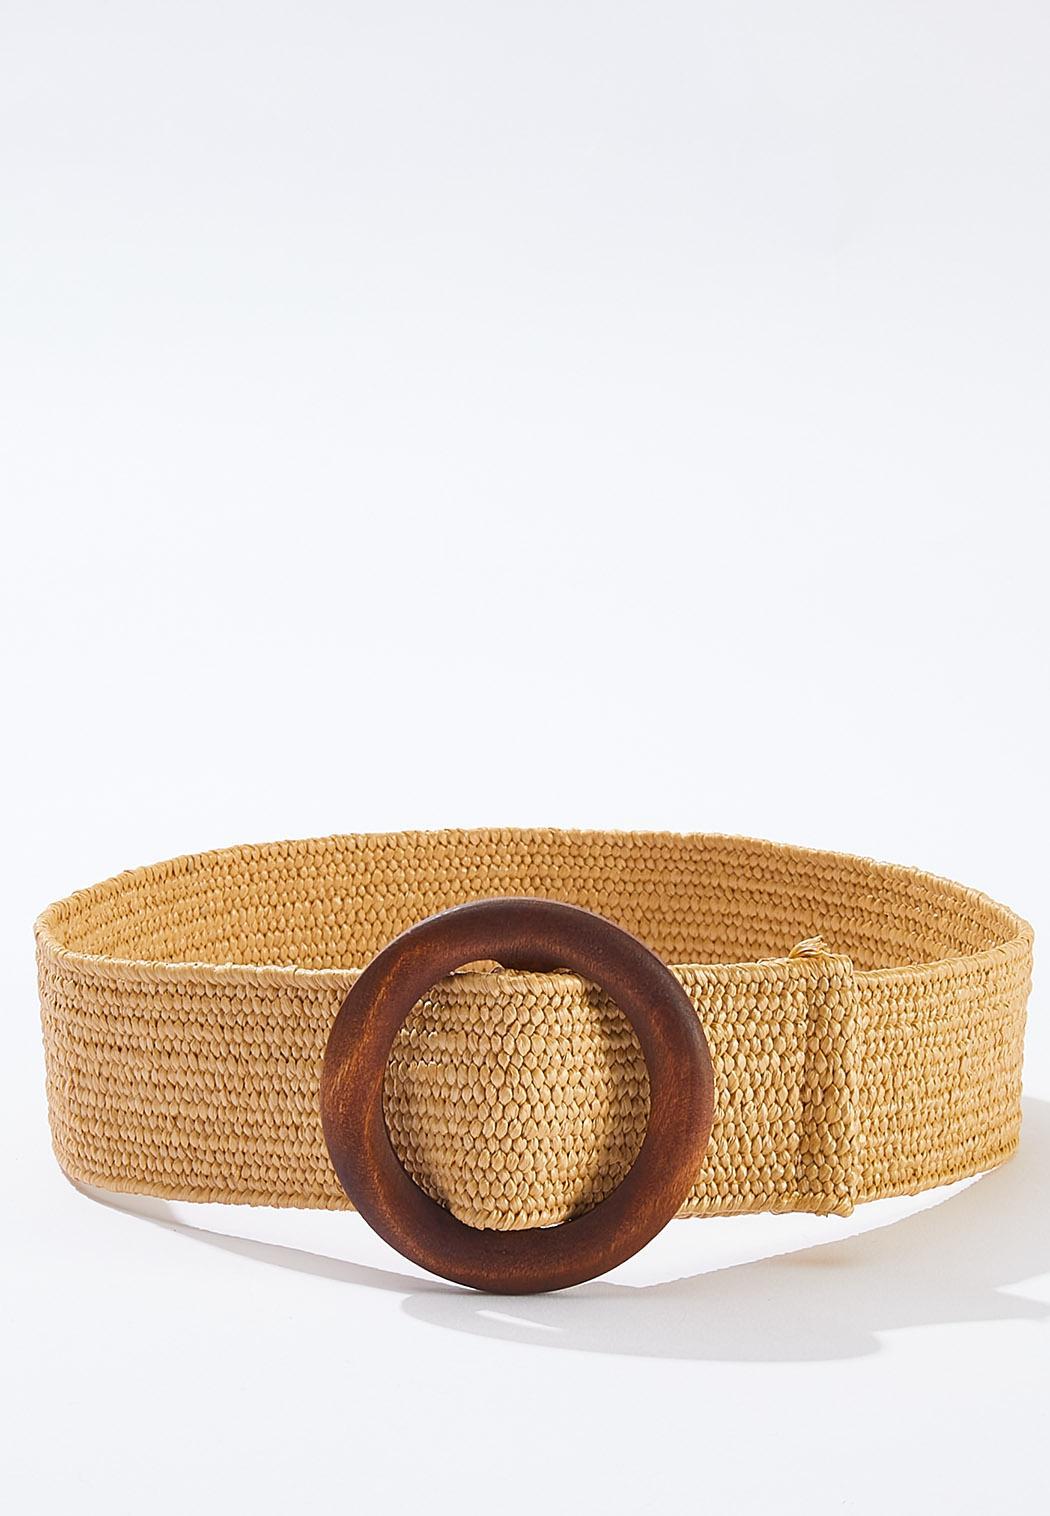 Plus Size Wood Buckle Stretch Belt